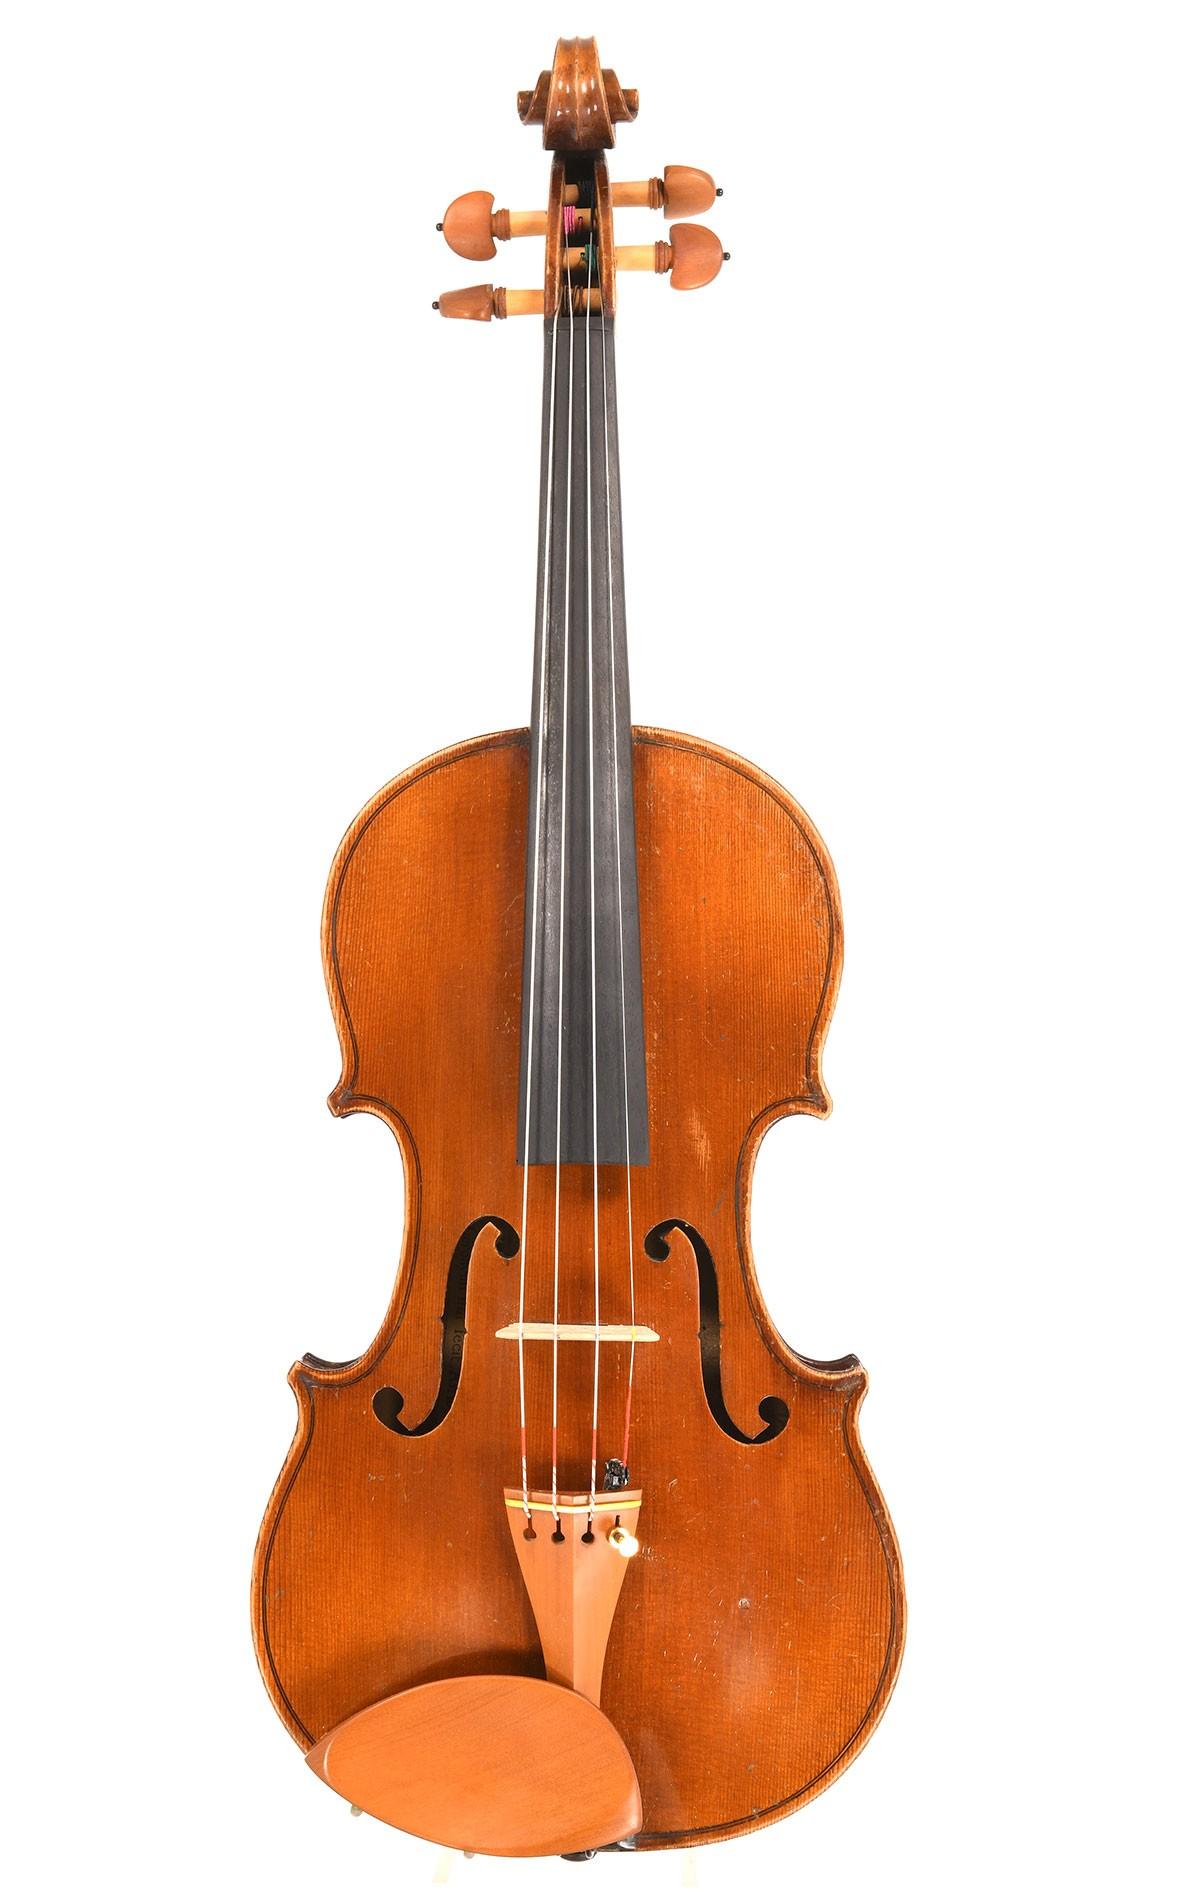 French violin by Laberte, Mirecourt - Amati model built around 1910